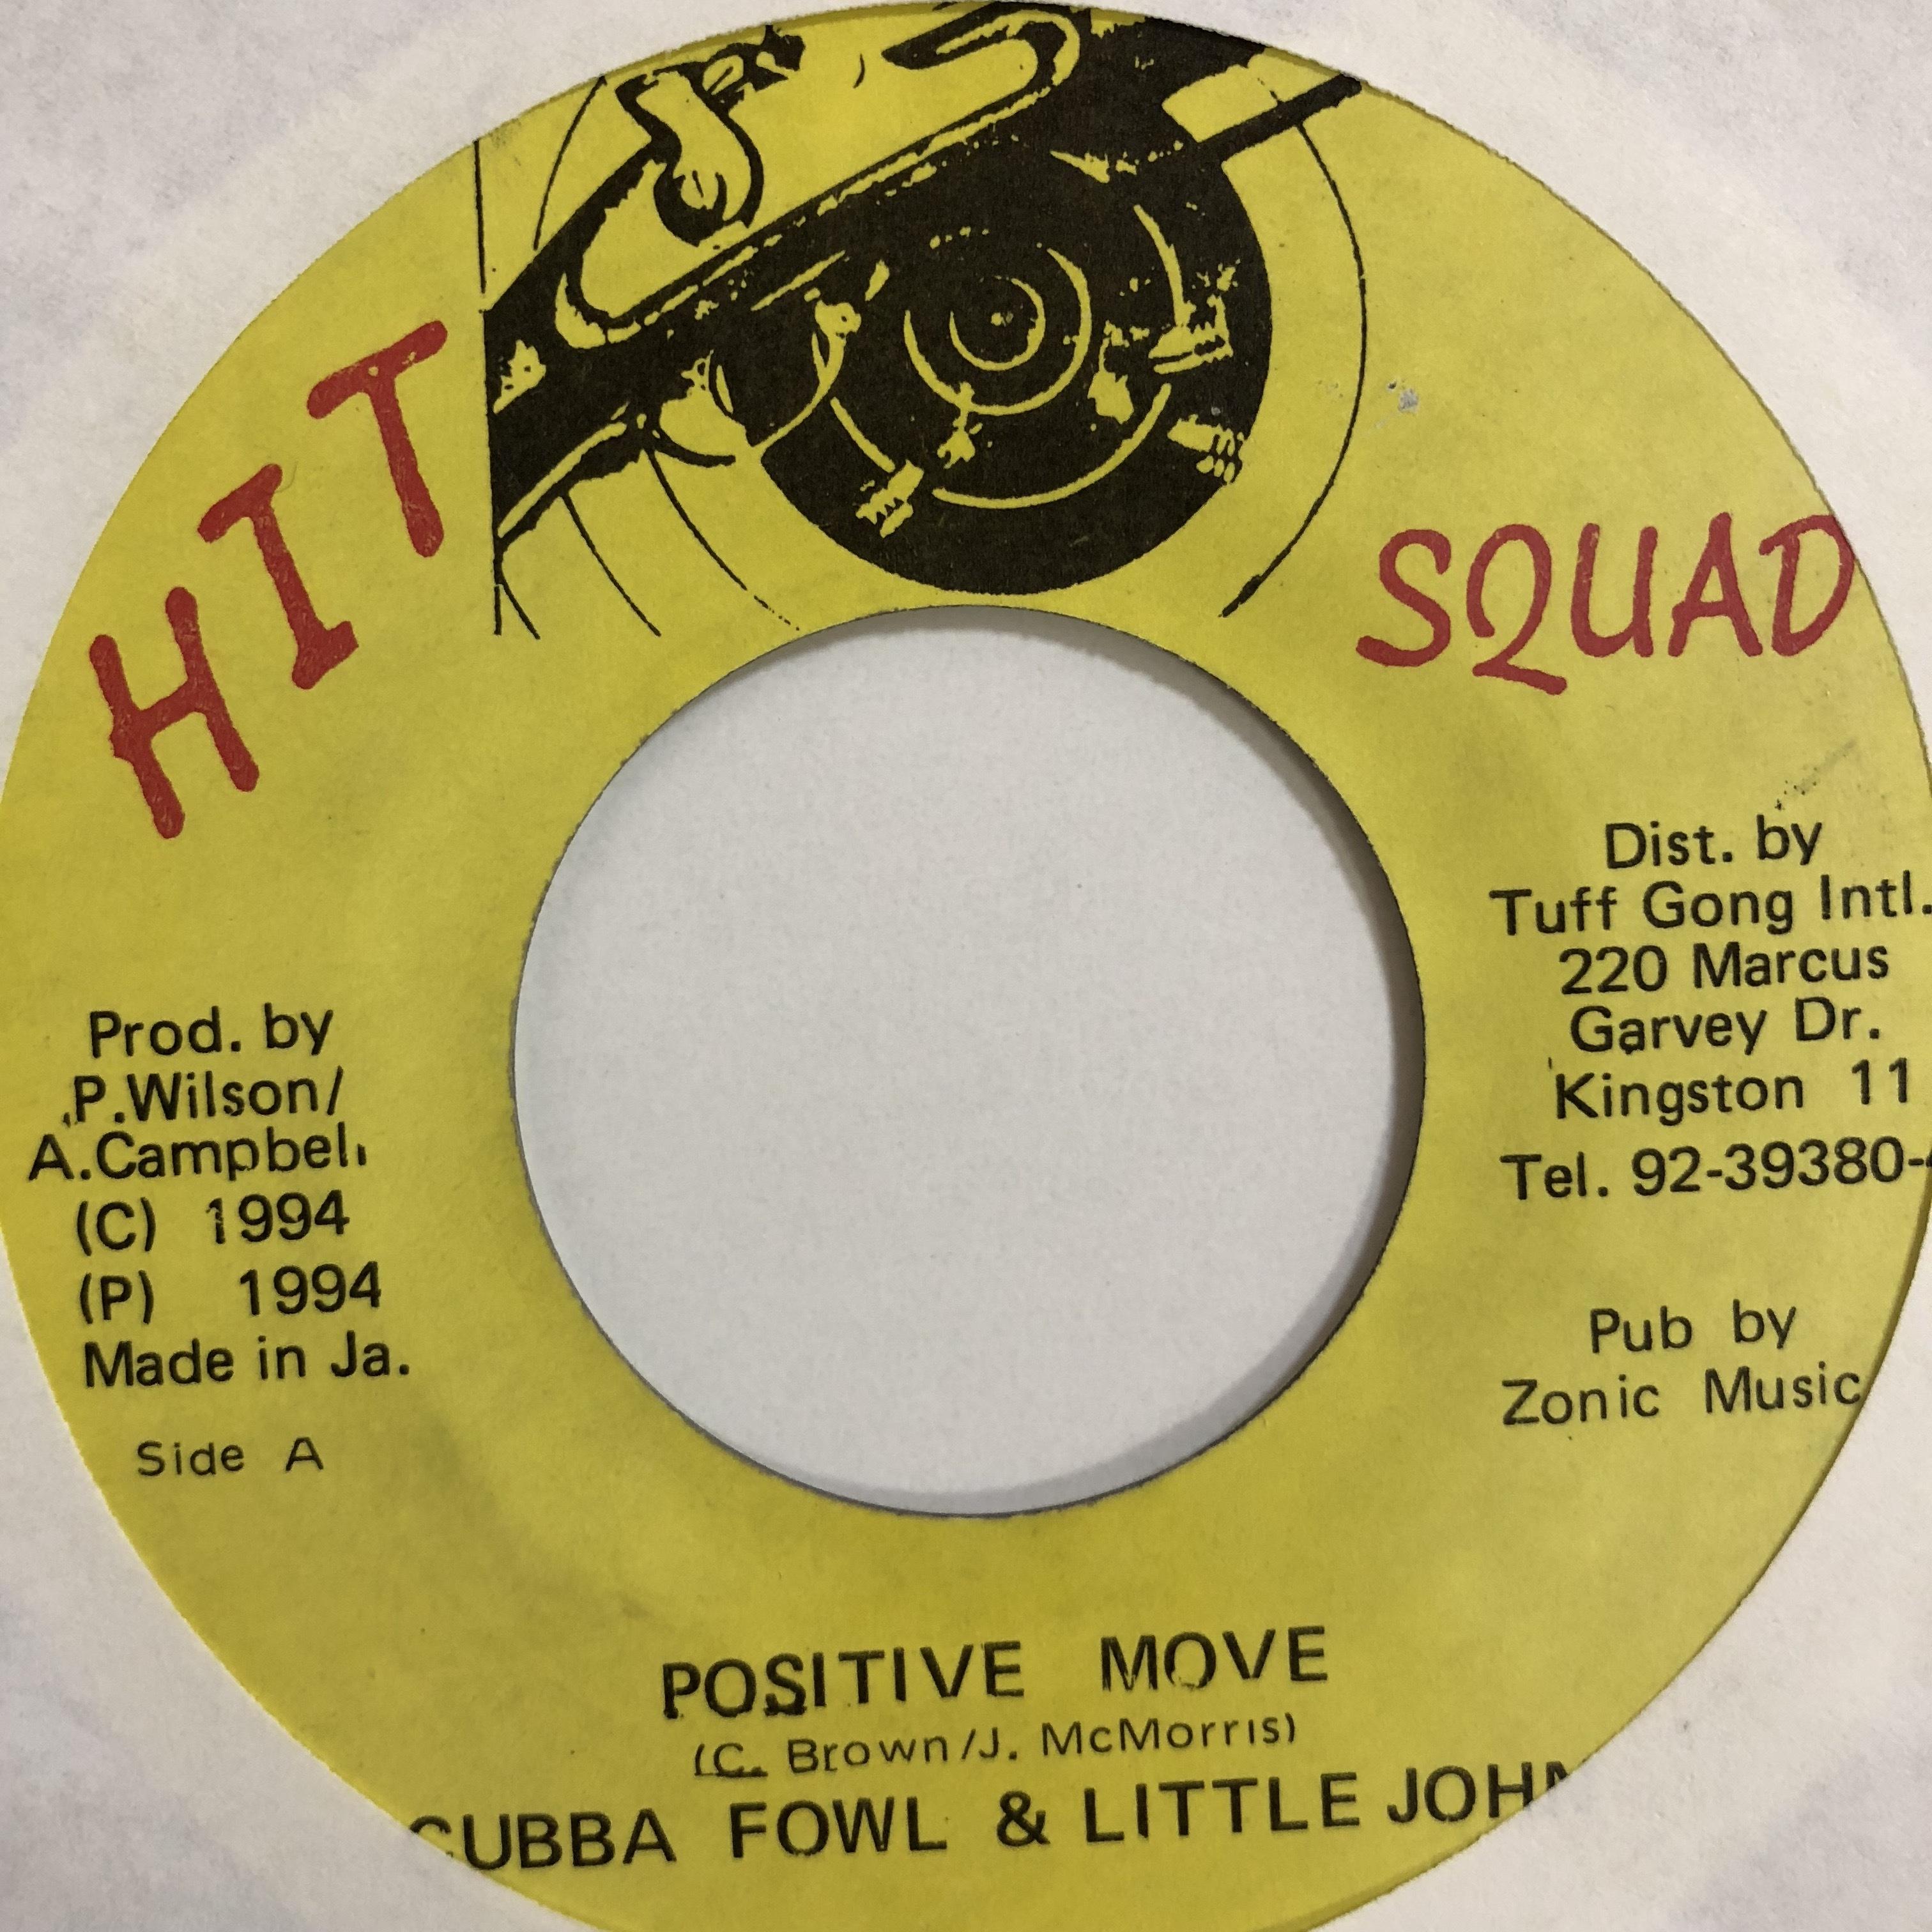 Cubba Fowl & Little John - Positive Move【7-10739】